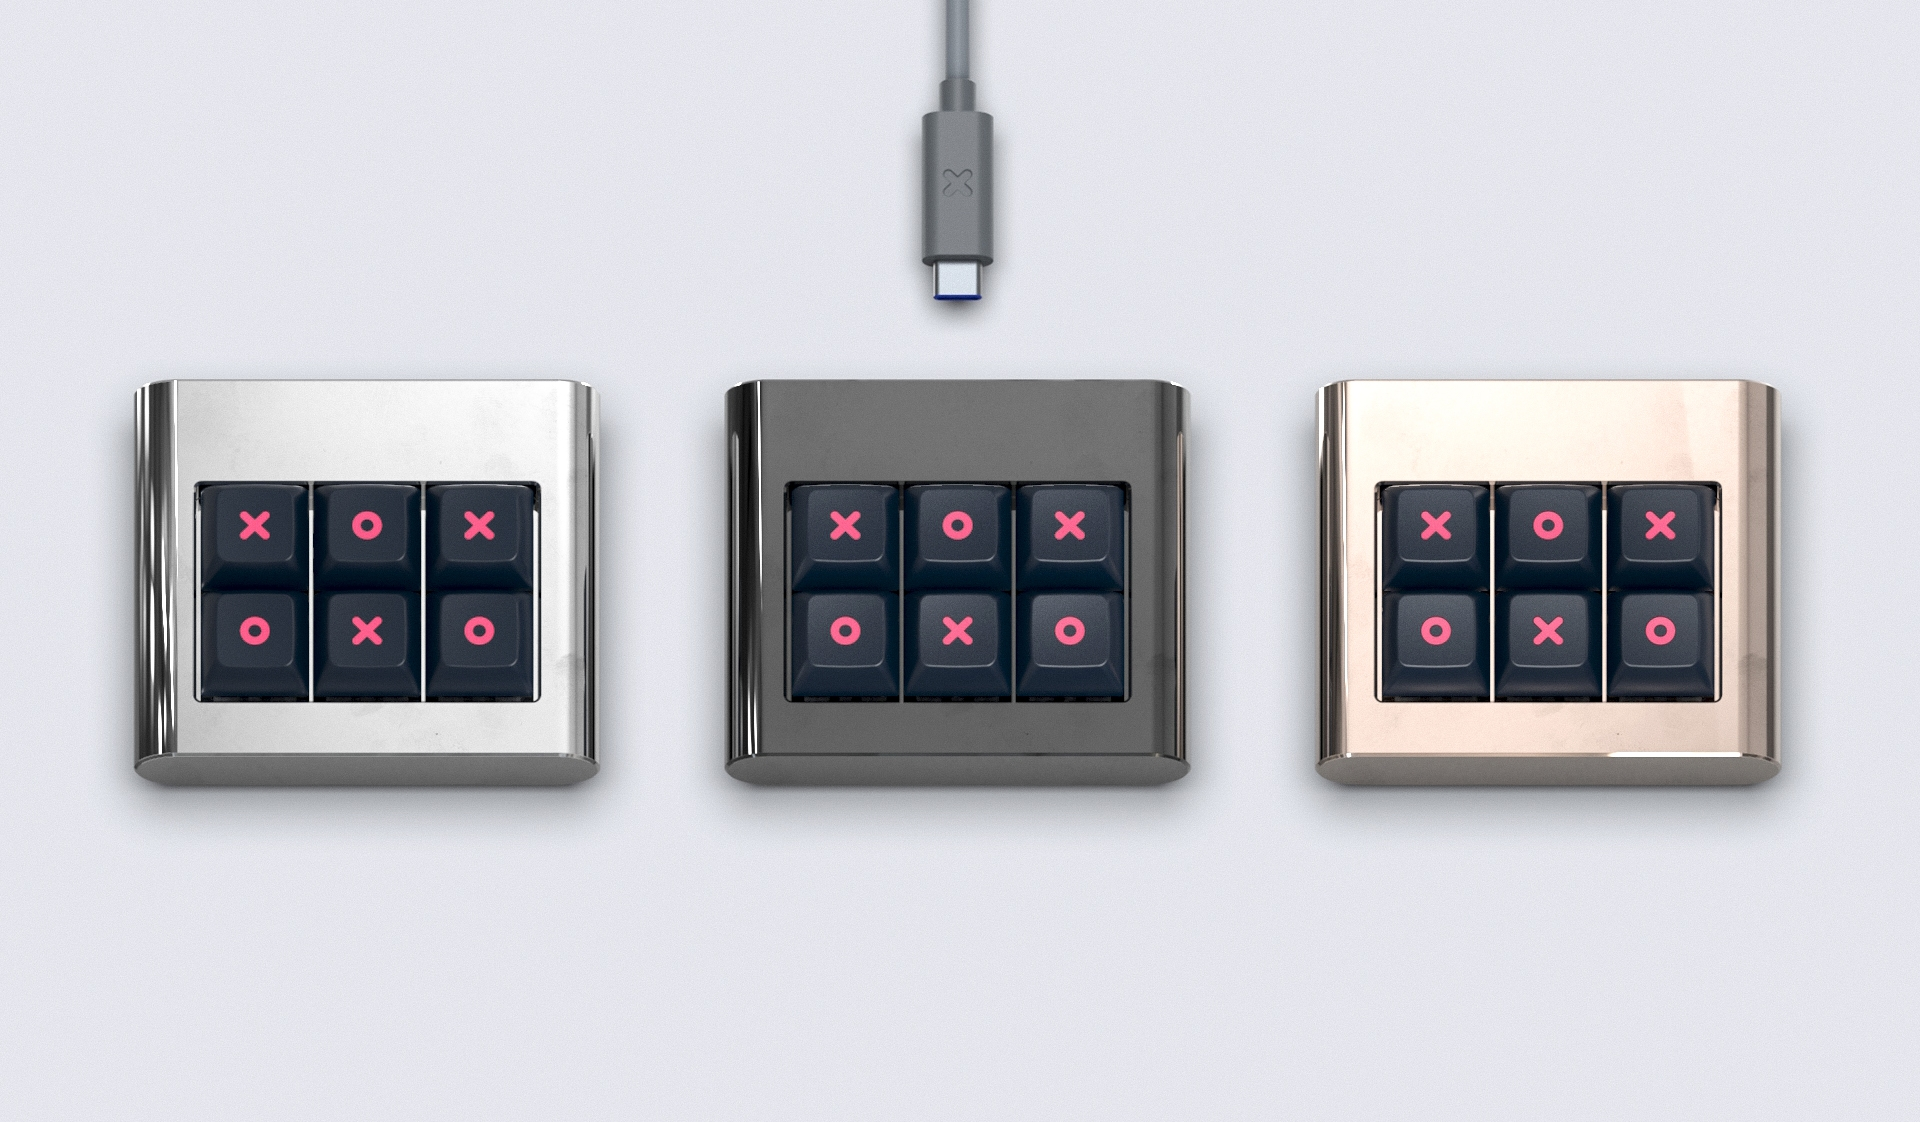 RAMA-RAMA-M6-DSA-XO-CAPS.73-3_1.jpg